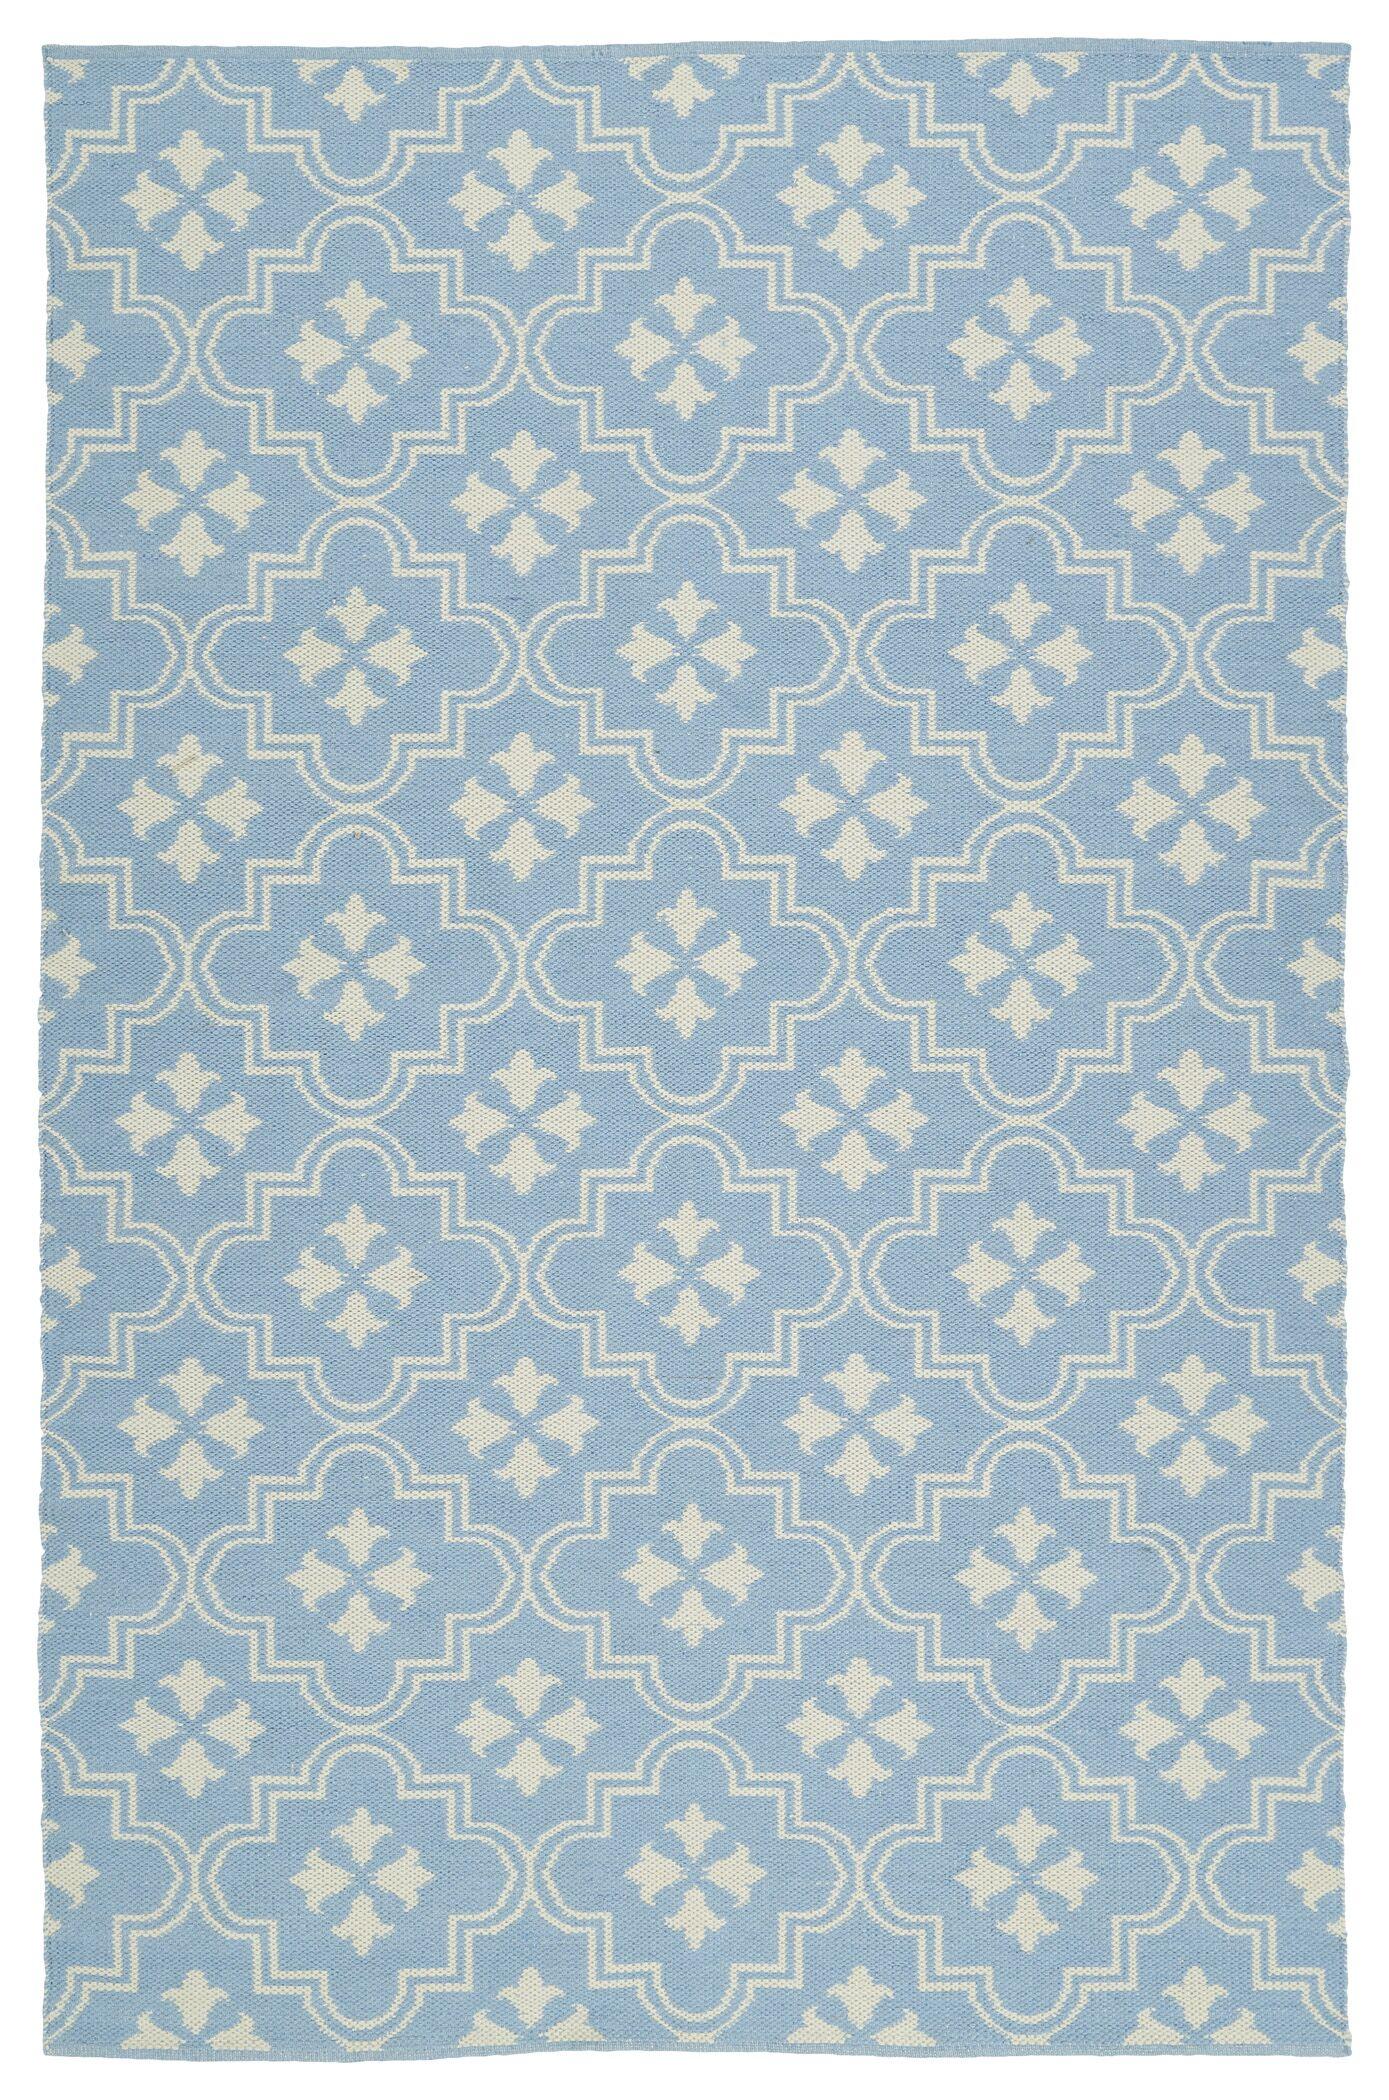 Covington Light Blue/Cream Indoor/Outdoor Area Rug Rug Size: Rectangle 5' x 7'6